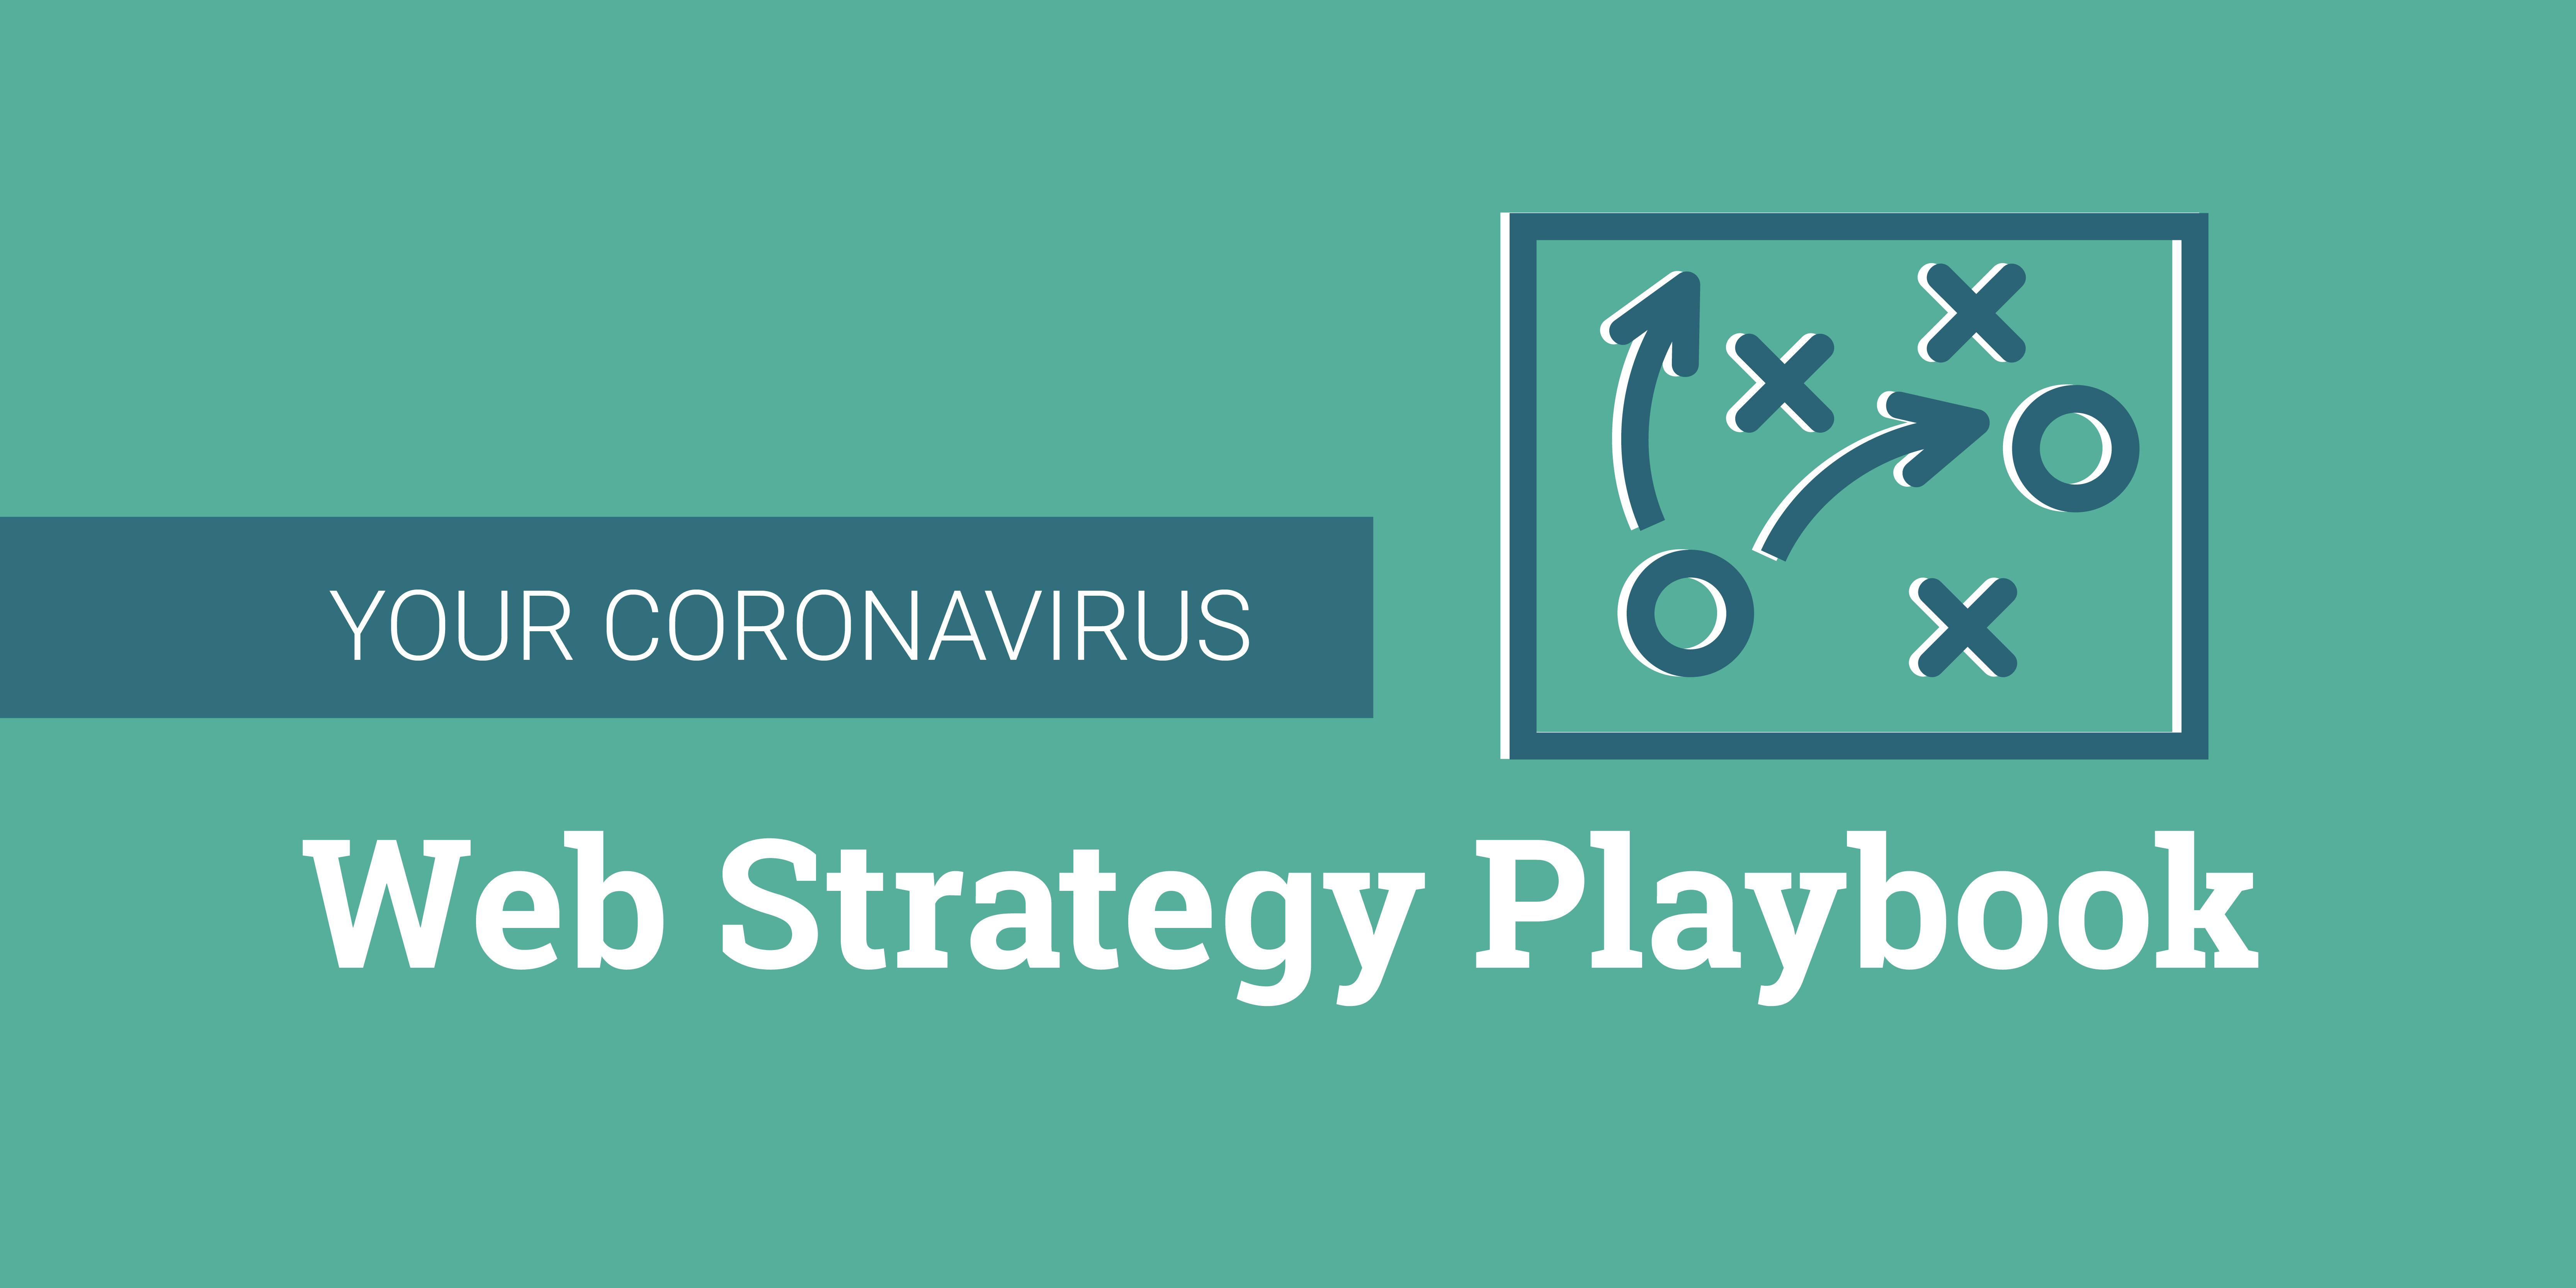 webstrategyplaybook-08